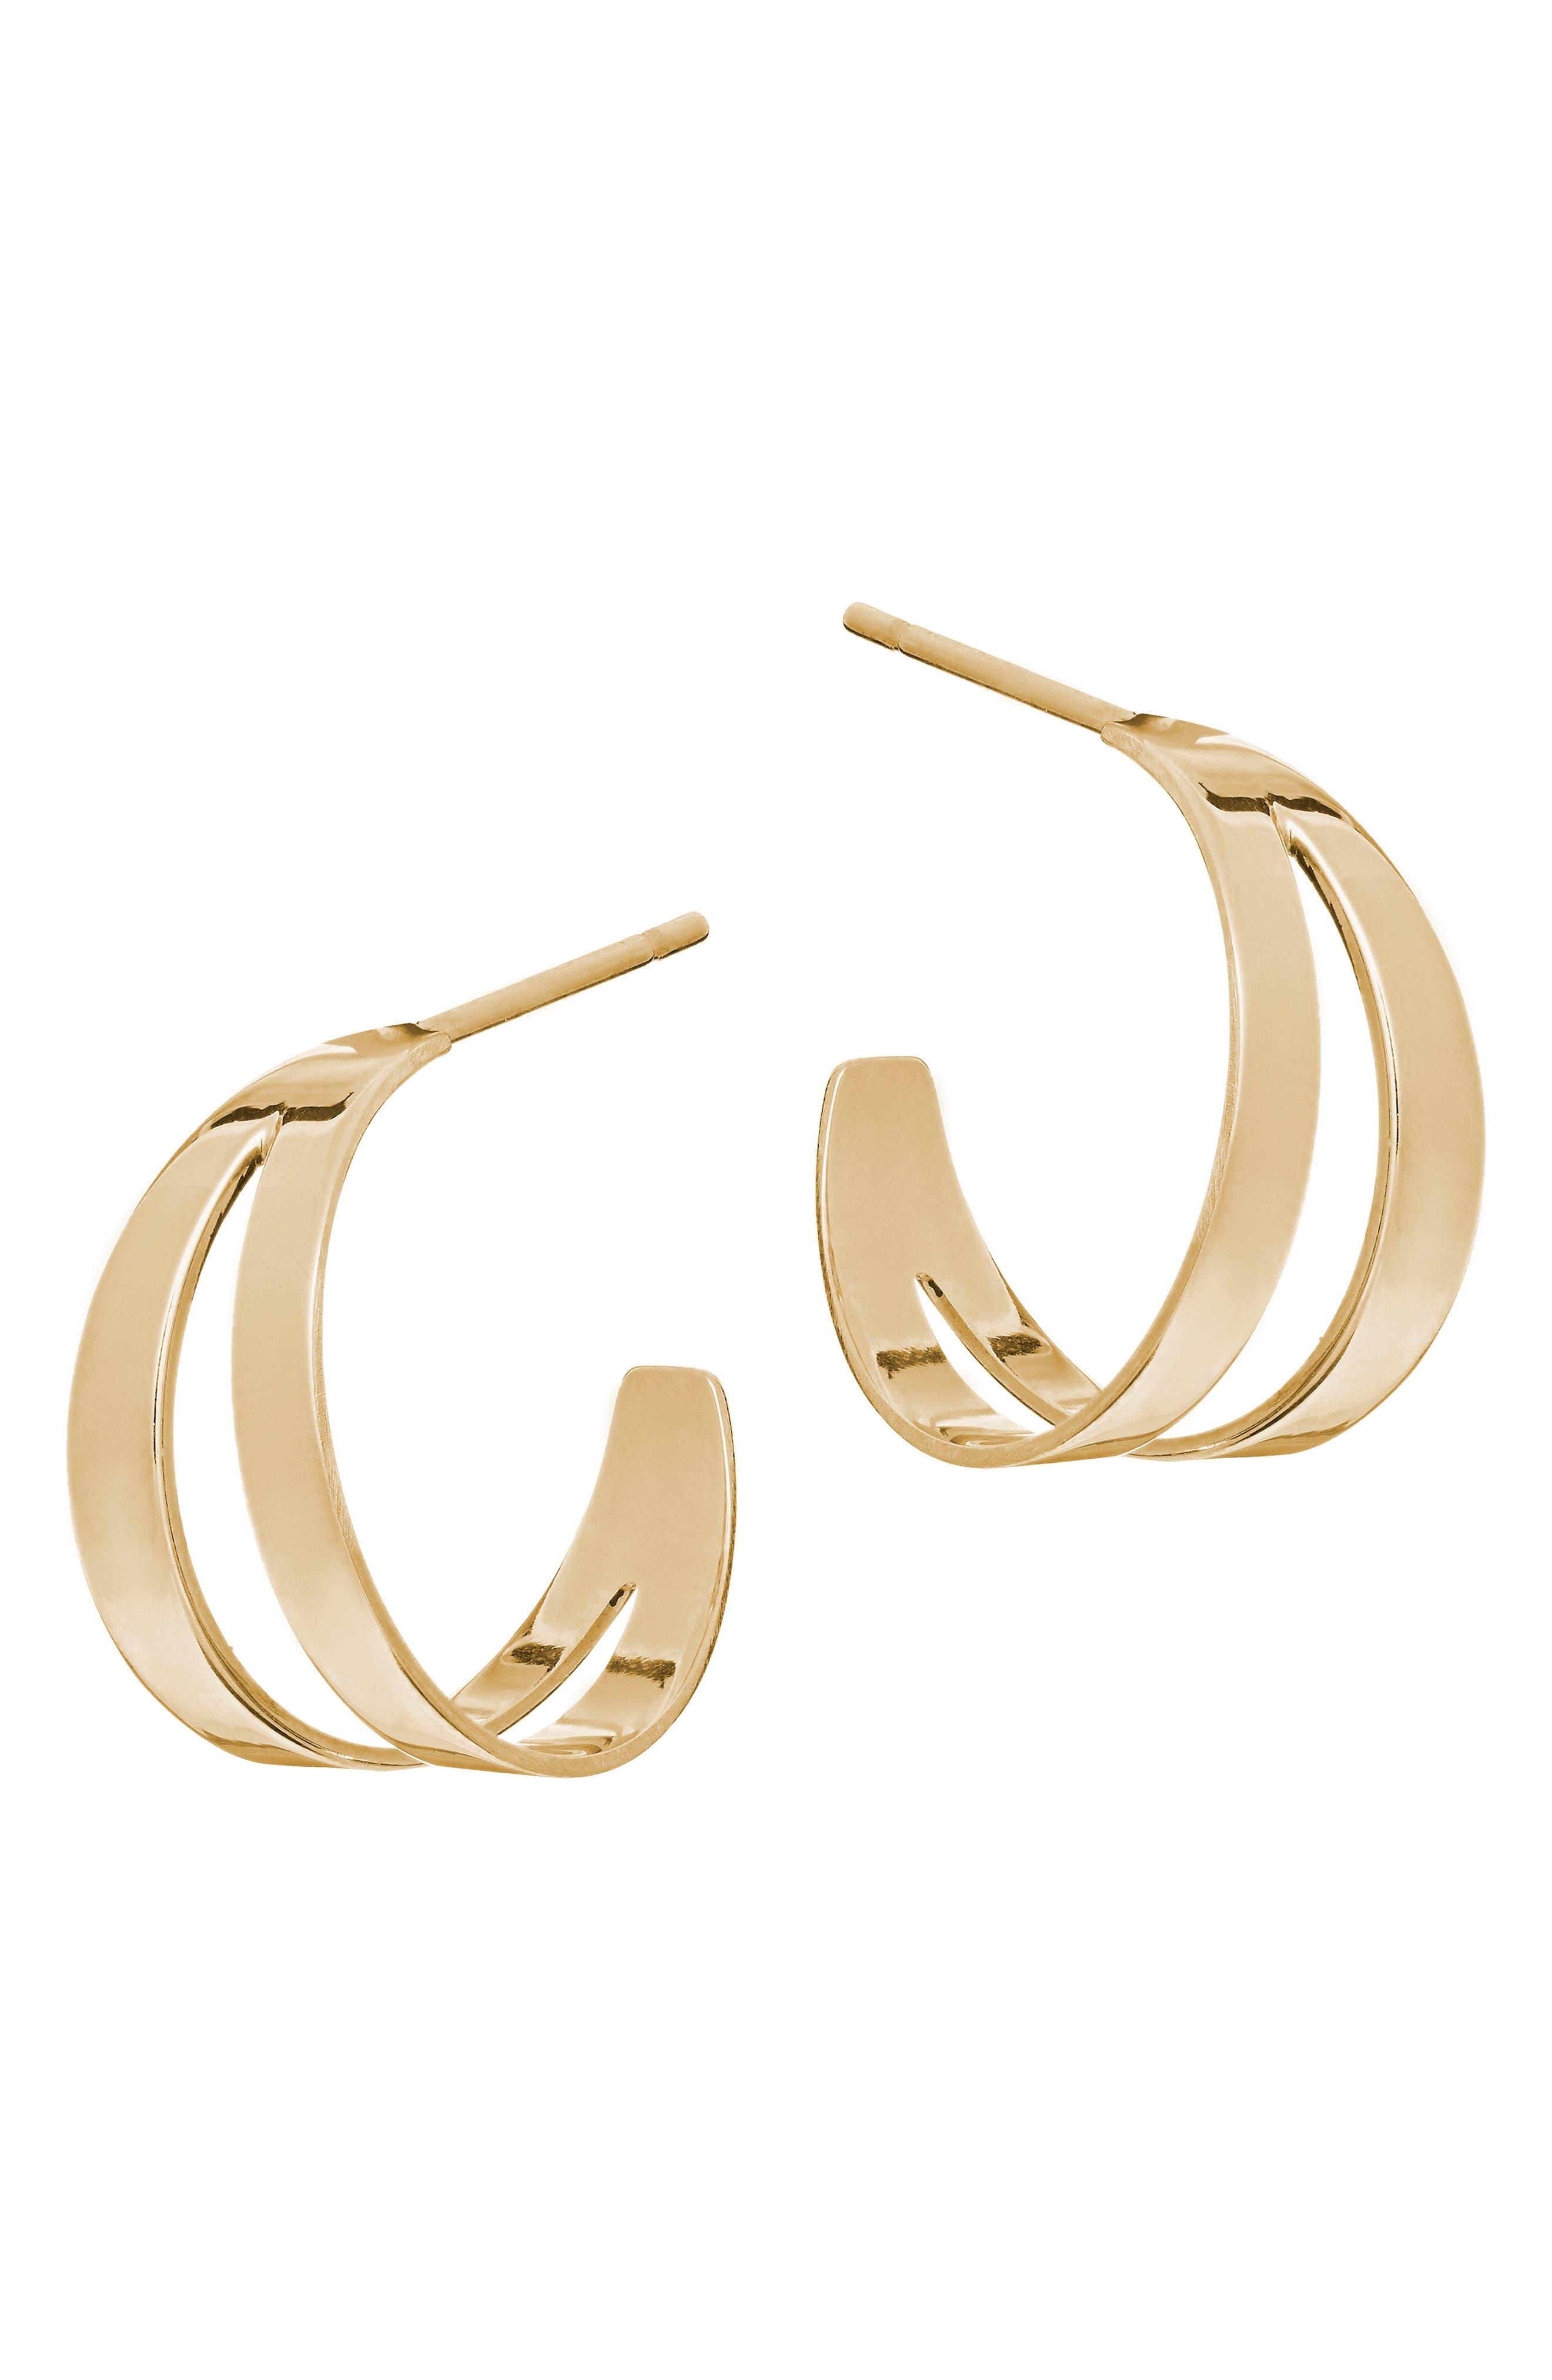 Small Hoop Earrings,                             Main thumbnail 1, color,                             Yellow Gold